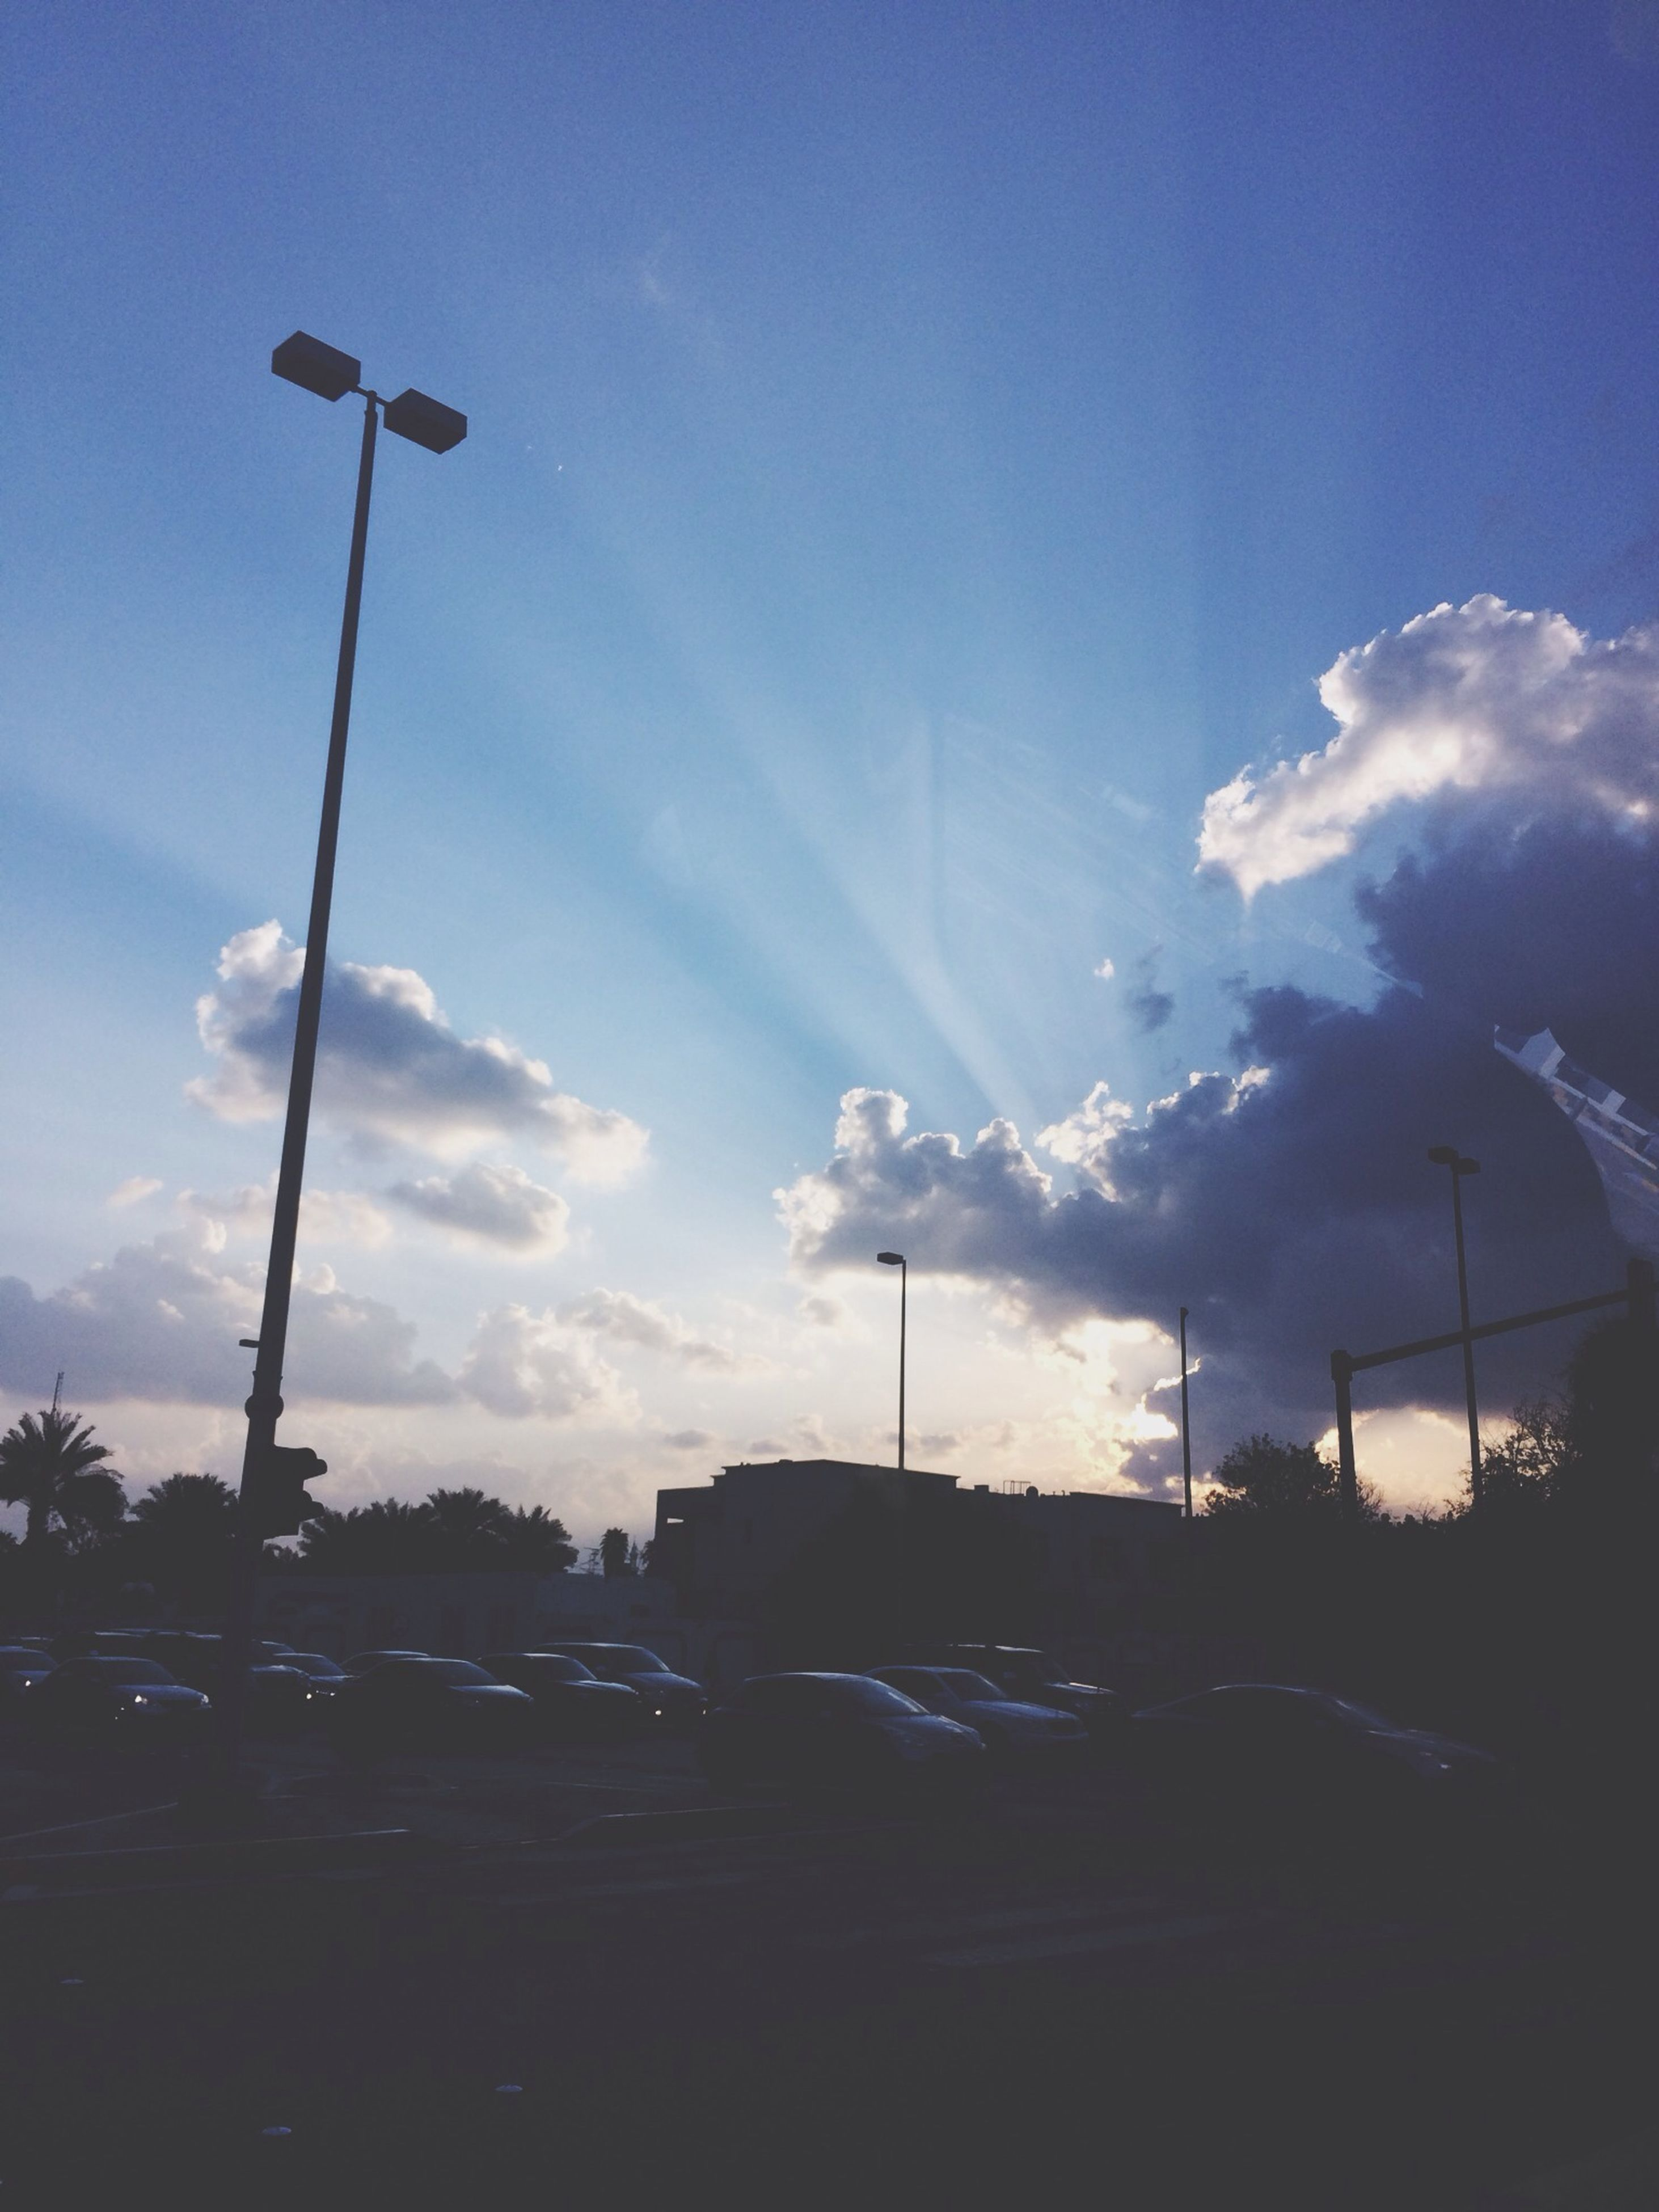 street light, transportation, sky, car, road, street, land vehicle, lighting equipment, blue, mode of transport, tree, silhouette, sunlight, the way forward, sun, cloud - sky, outdoors, nature, sunset, cloud